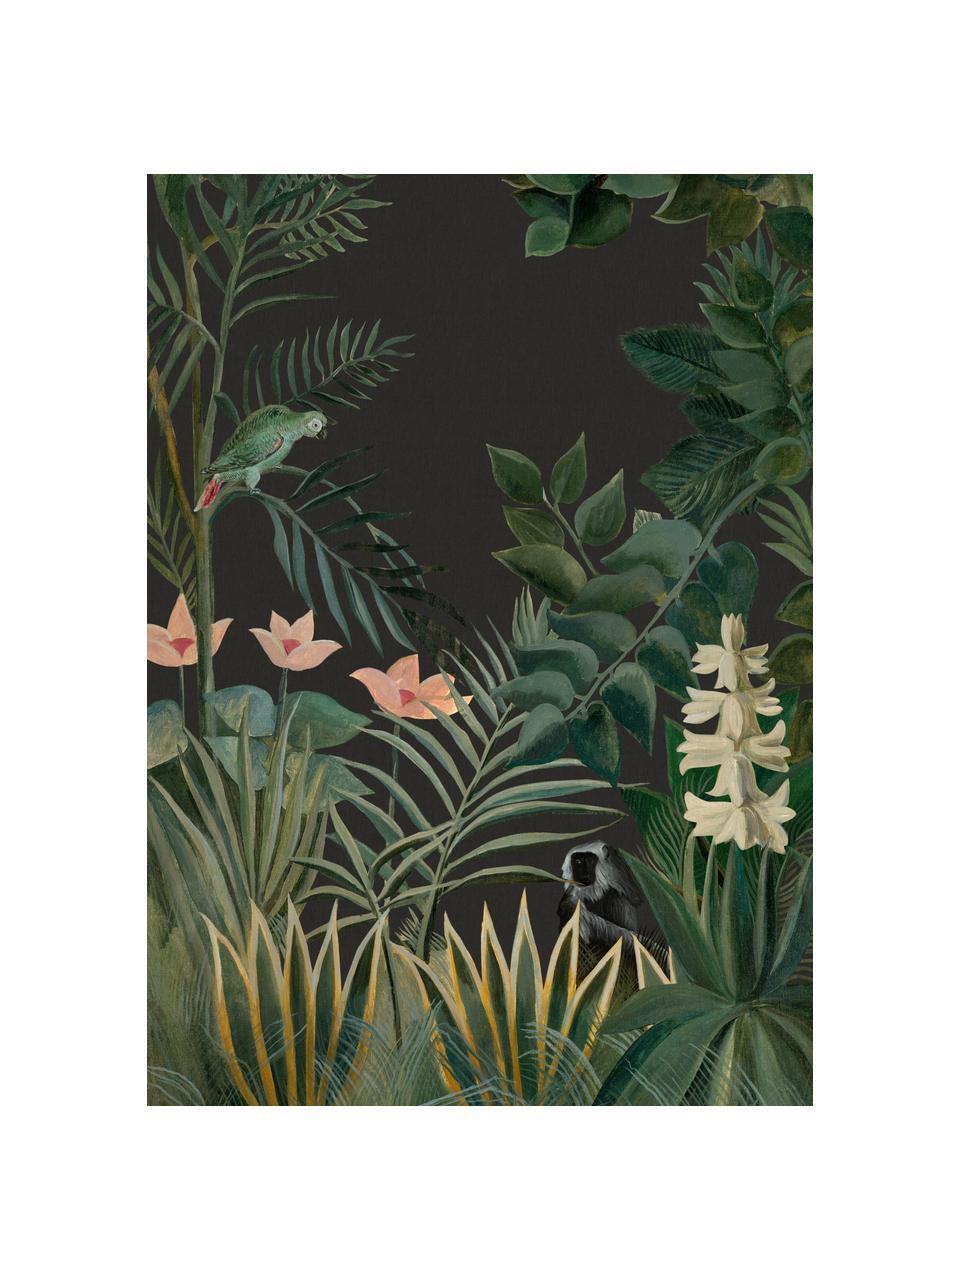 Fototapete Into the blush, Vlies, Dunkelgrün, Rosa, Hellgrün, 200 x 280 cm